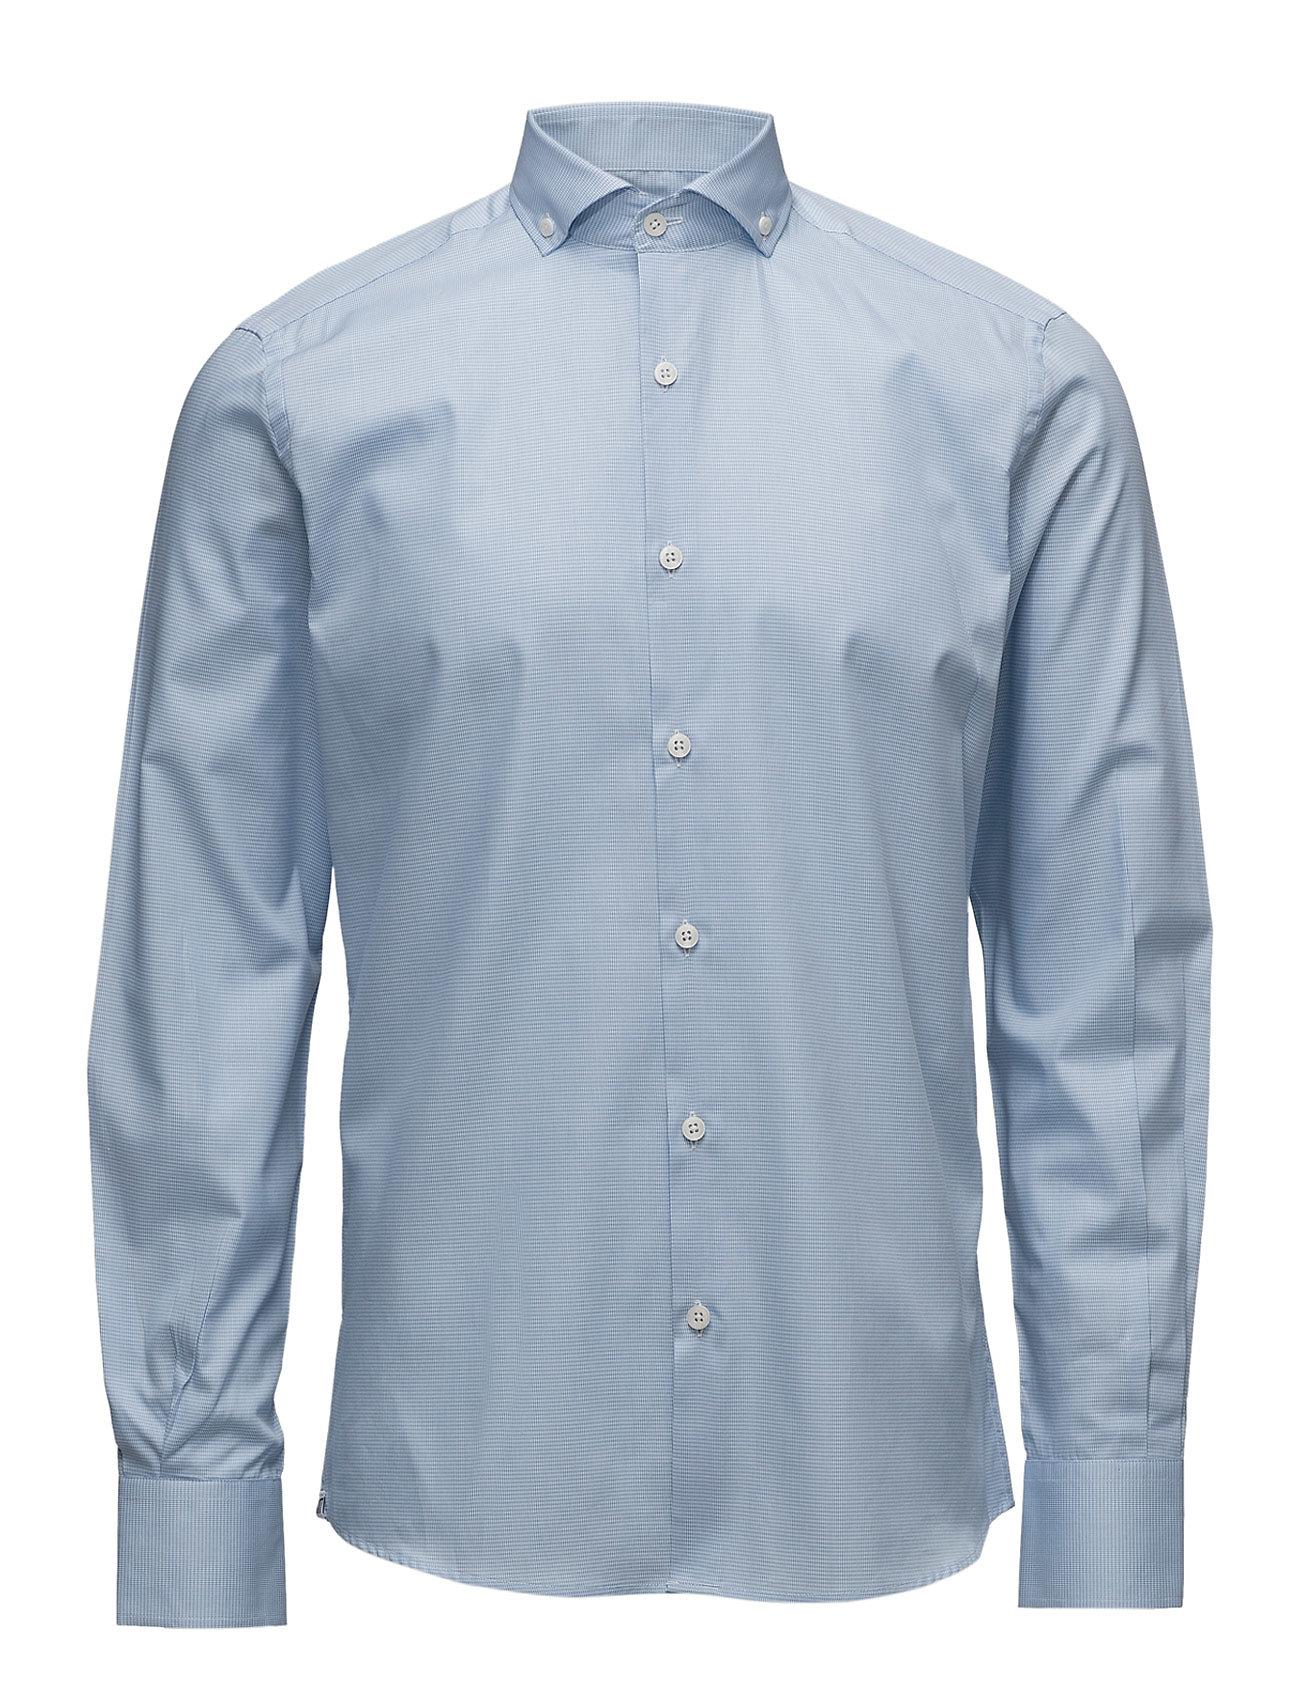 dae7cf34 Stilige Cr7 Shirt Slim Fit CR7 Forretnings til i behagelige materialer